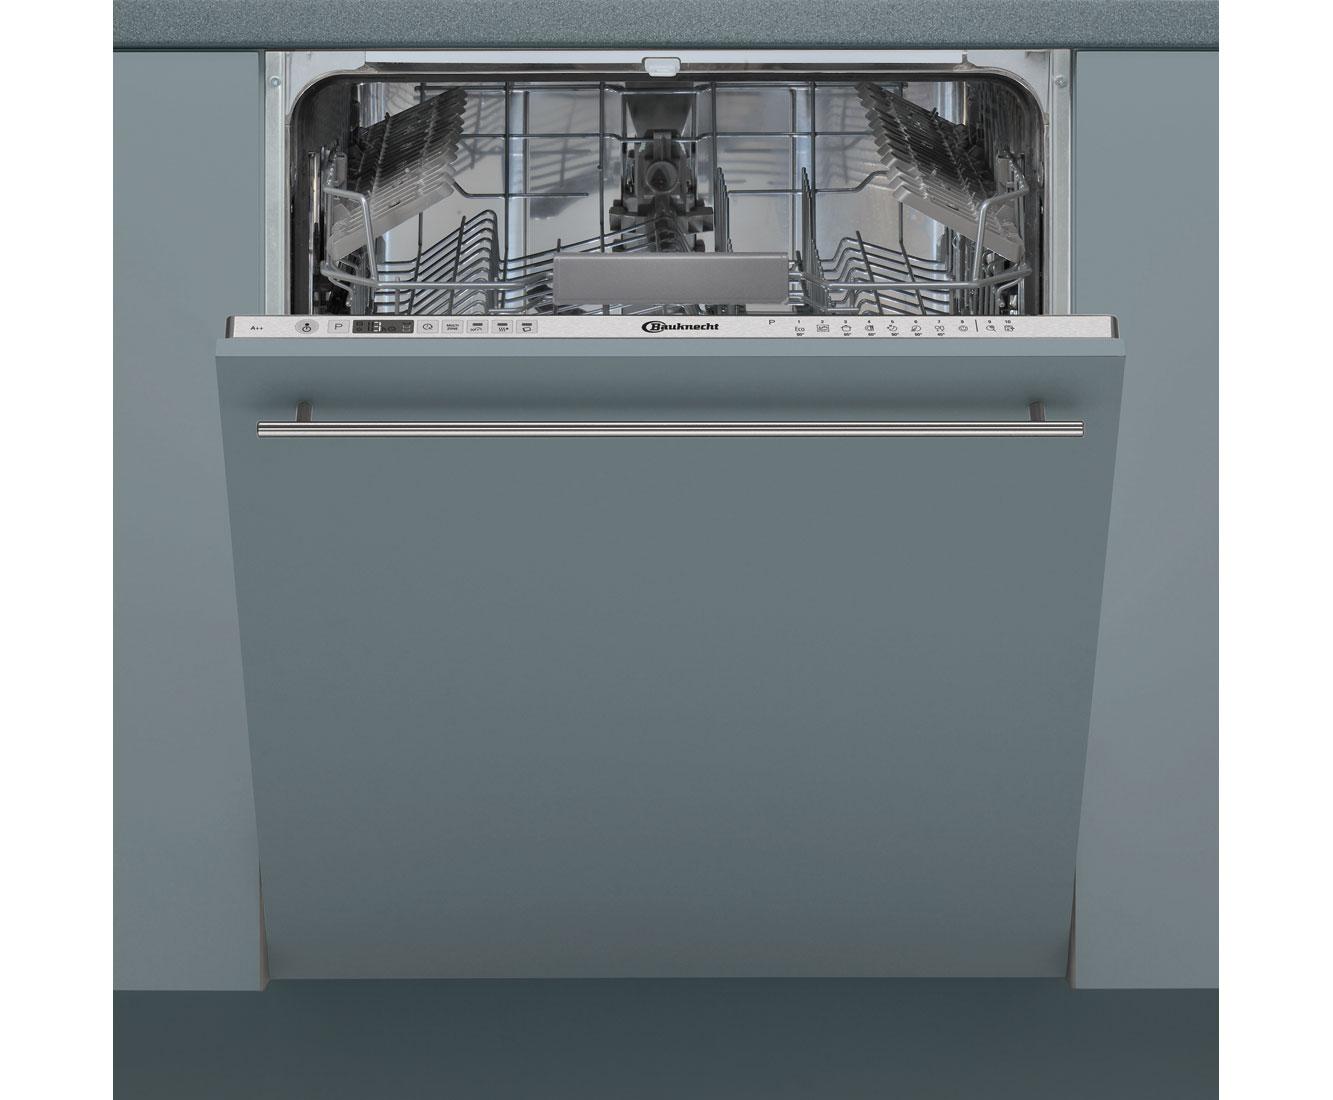 Kühlschrank Ph2 : Ikea kühlschrank front montage: küchenbau metod unterschrank spüle